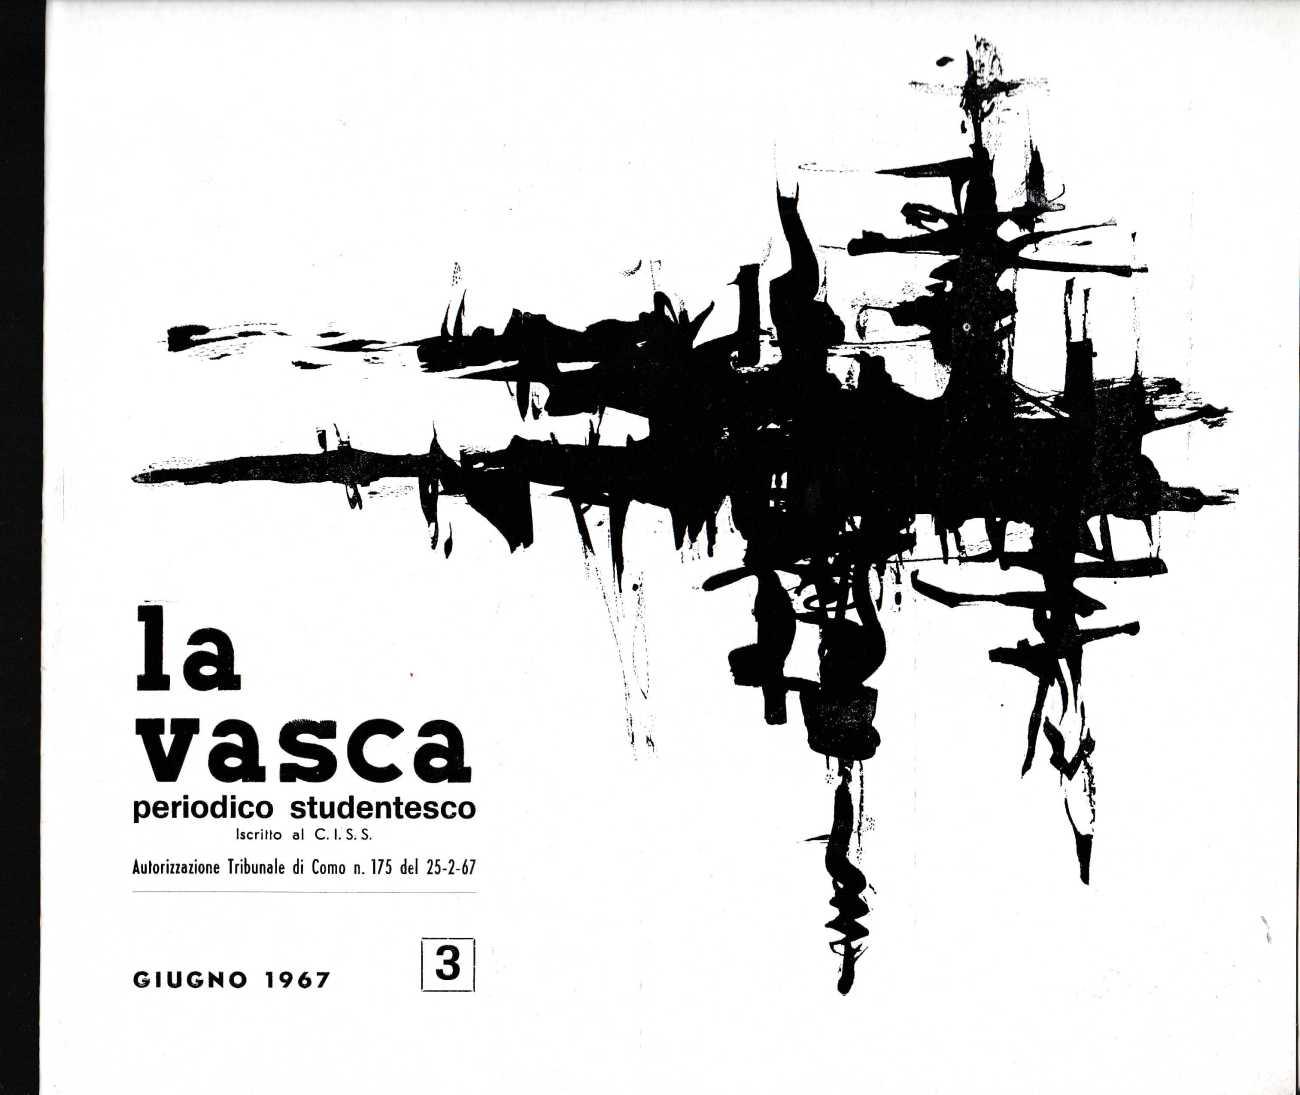 LA VASCA 2862